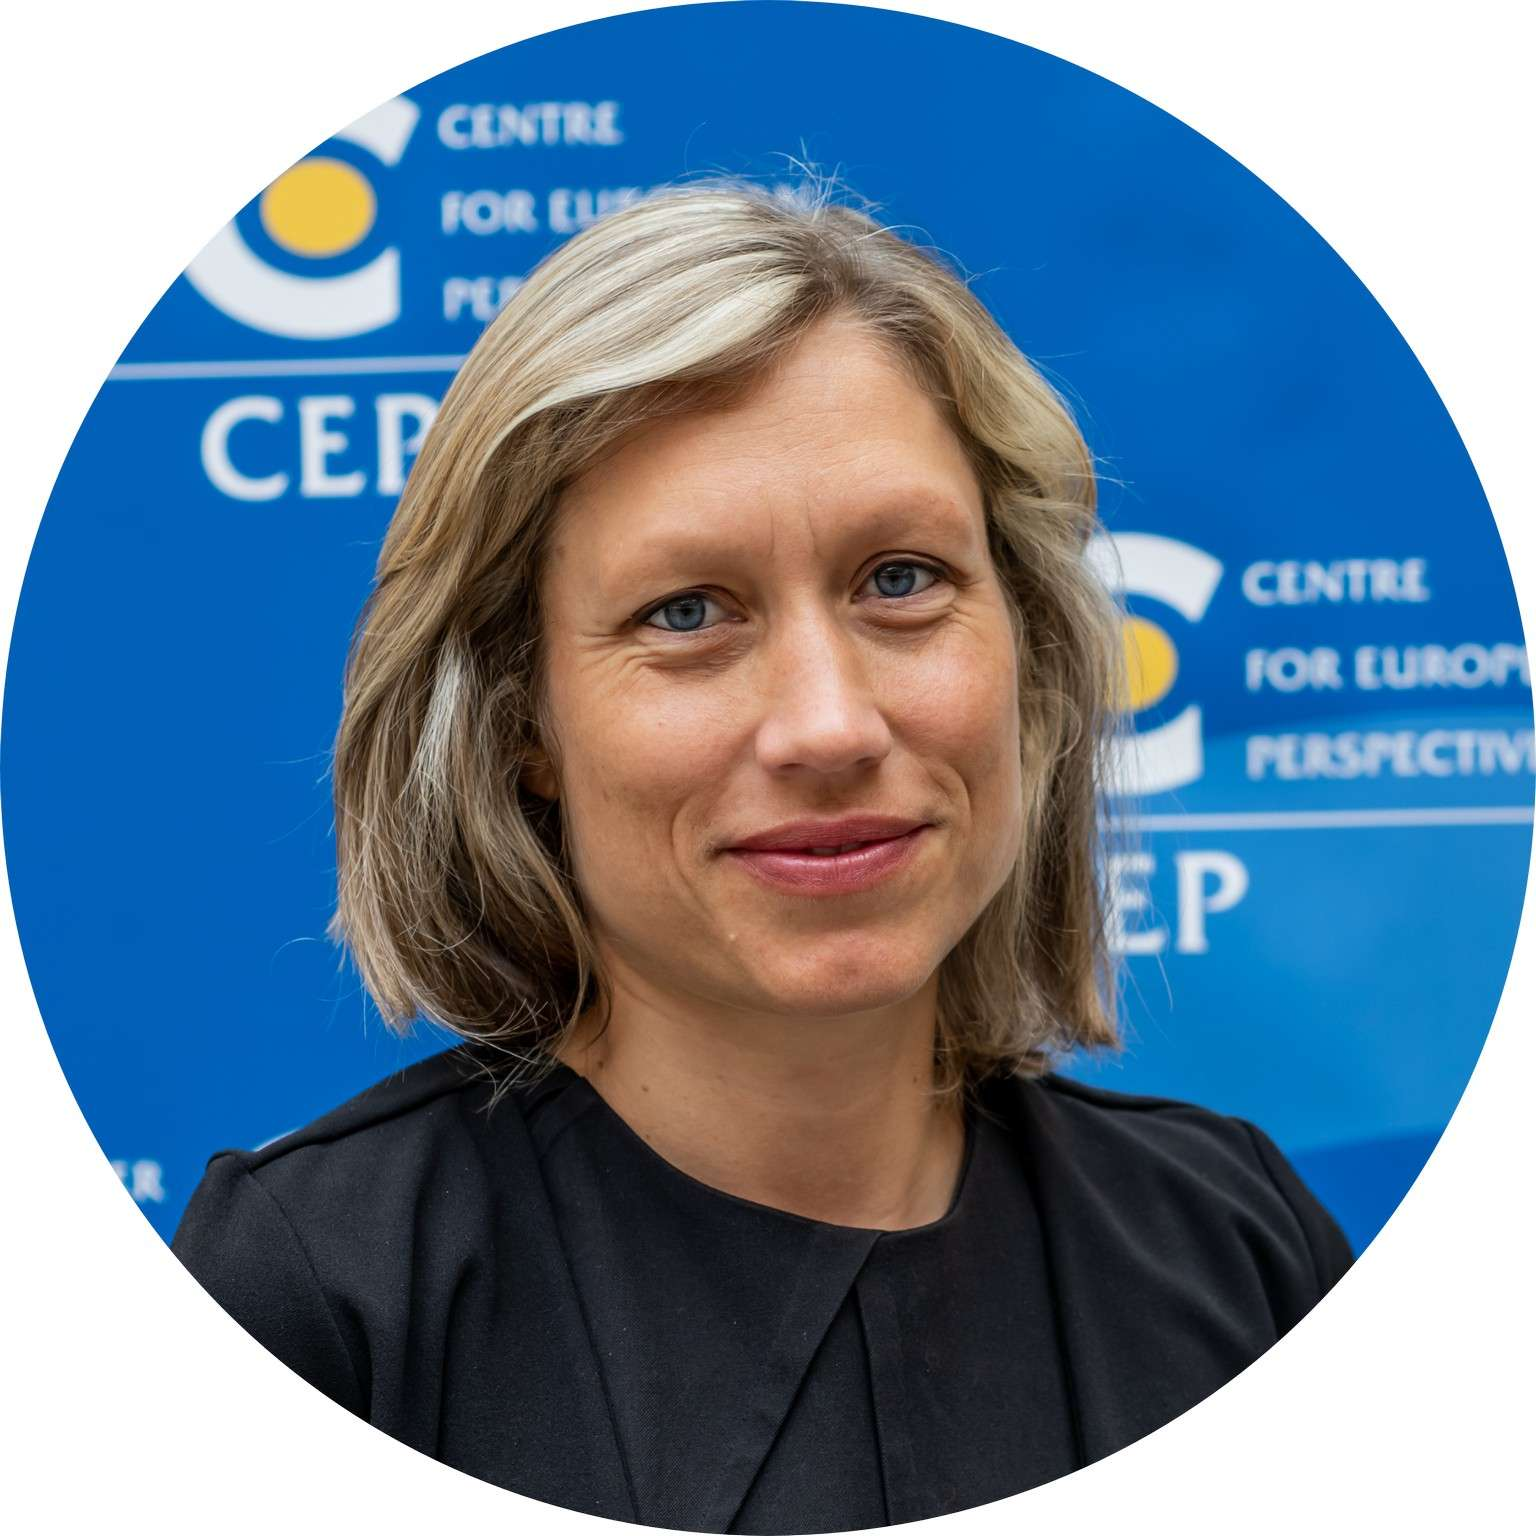 Katja GERŠAK